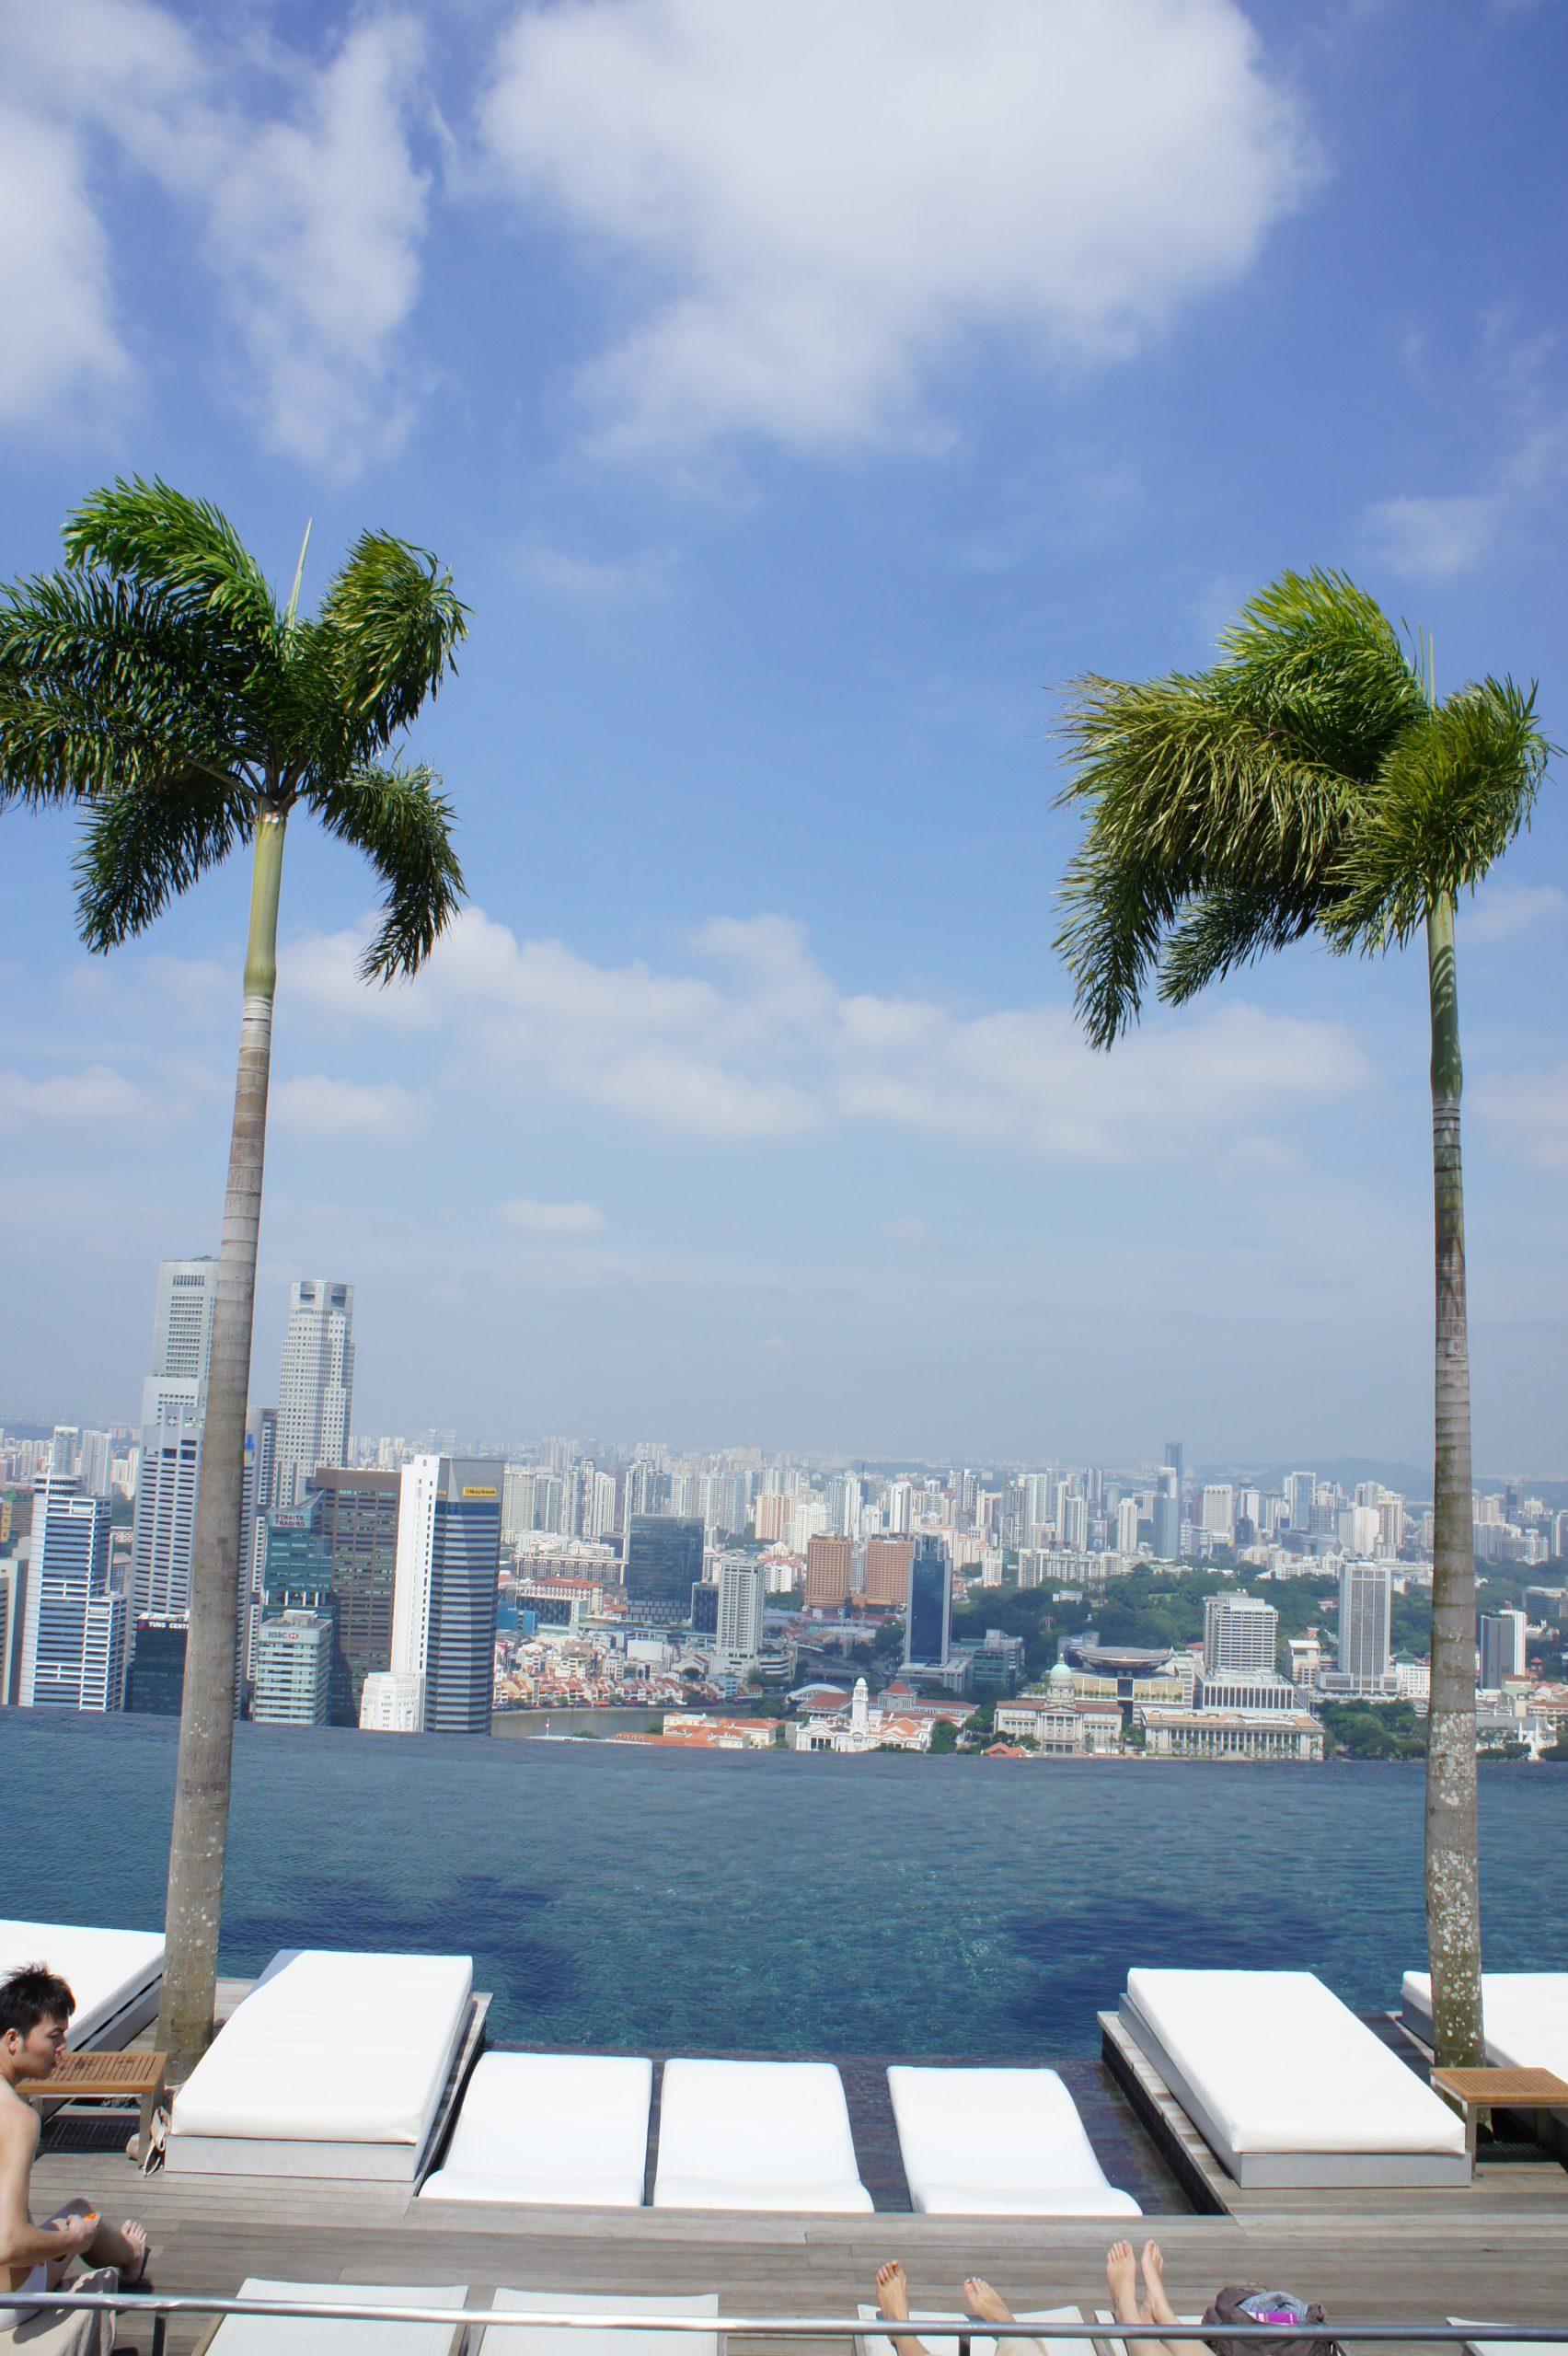 Singapour | Kangouroad concernant Piscine Singapour